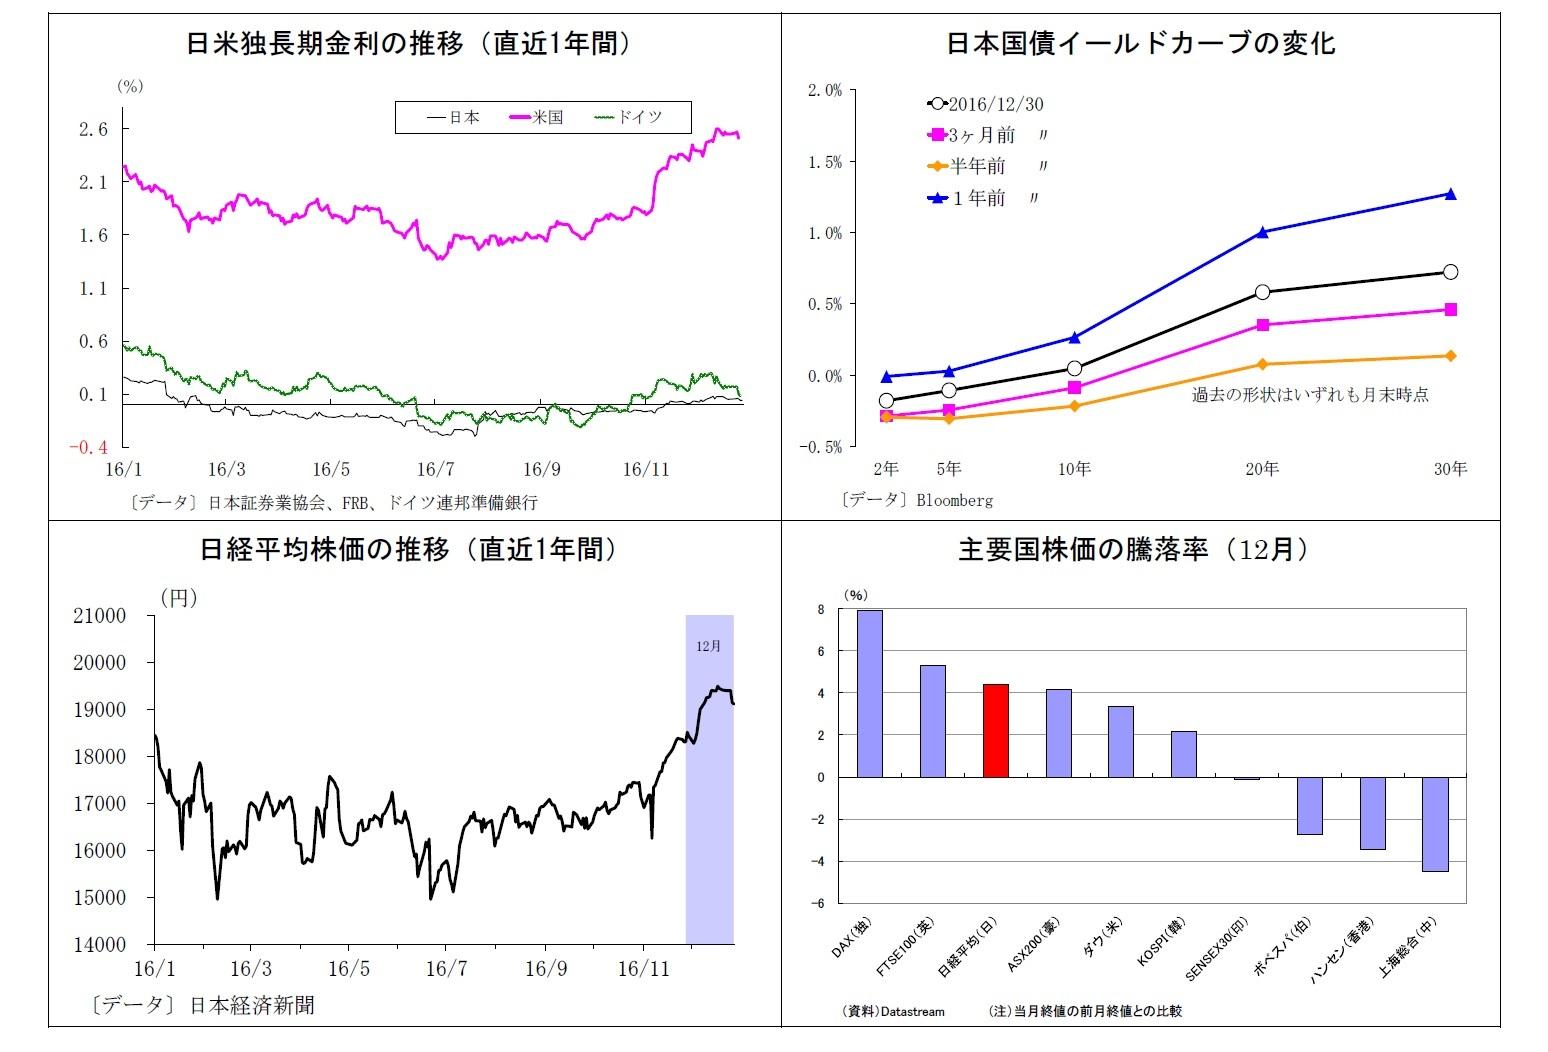 日米独長期金利の推移(直近1年間)/日本国債イールドカーブの変化/日経平均株価の推移(直近1年間)/主要国株価の騰落率(12月)